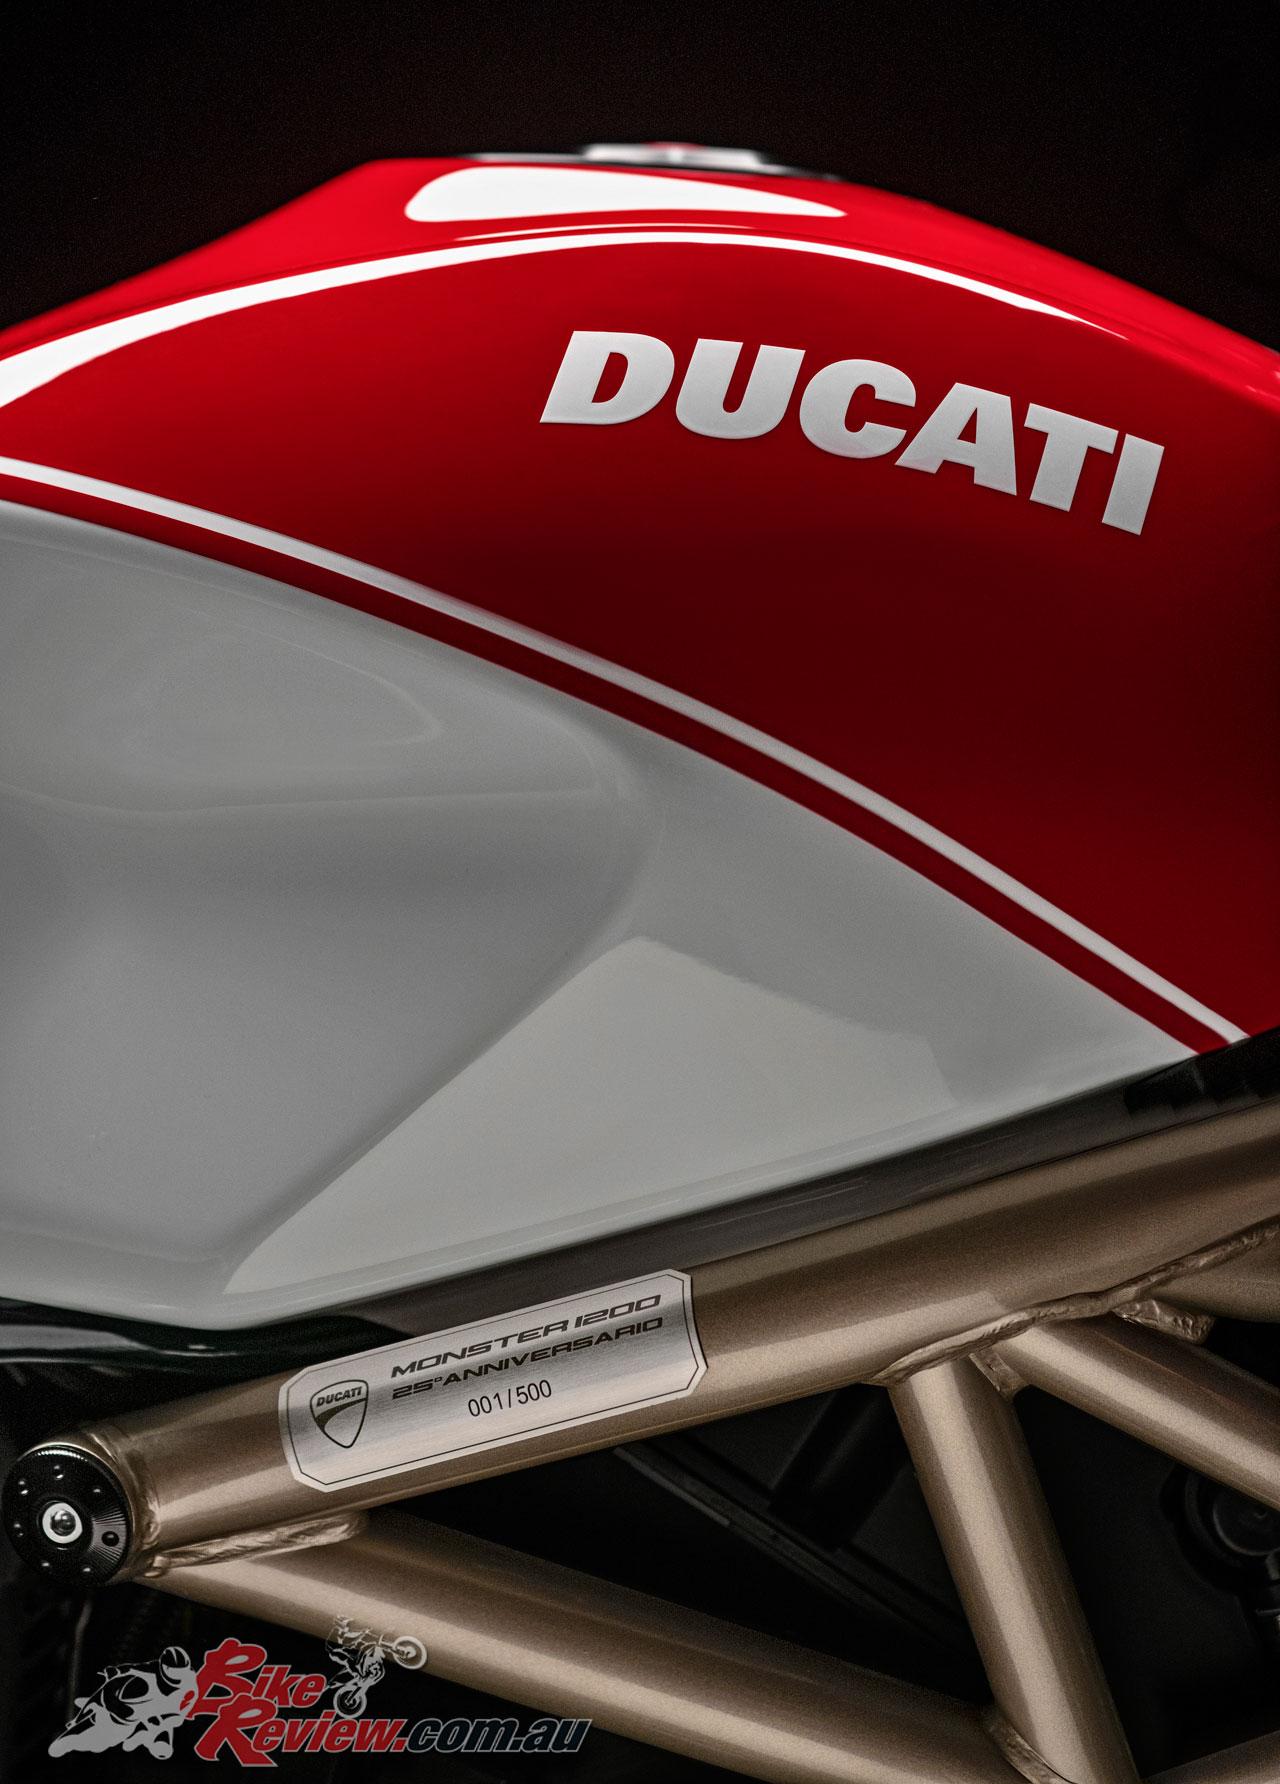 2018 Ducati Monster 1200 25° Anniversario